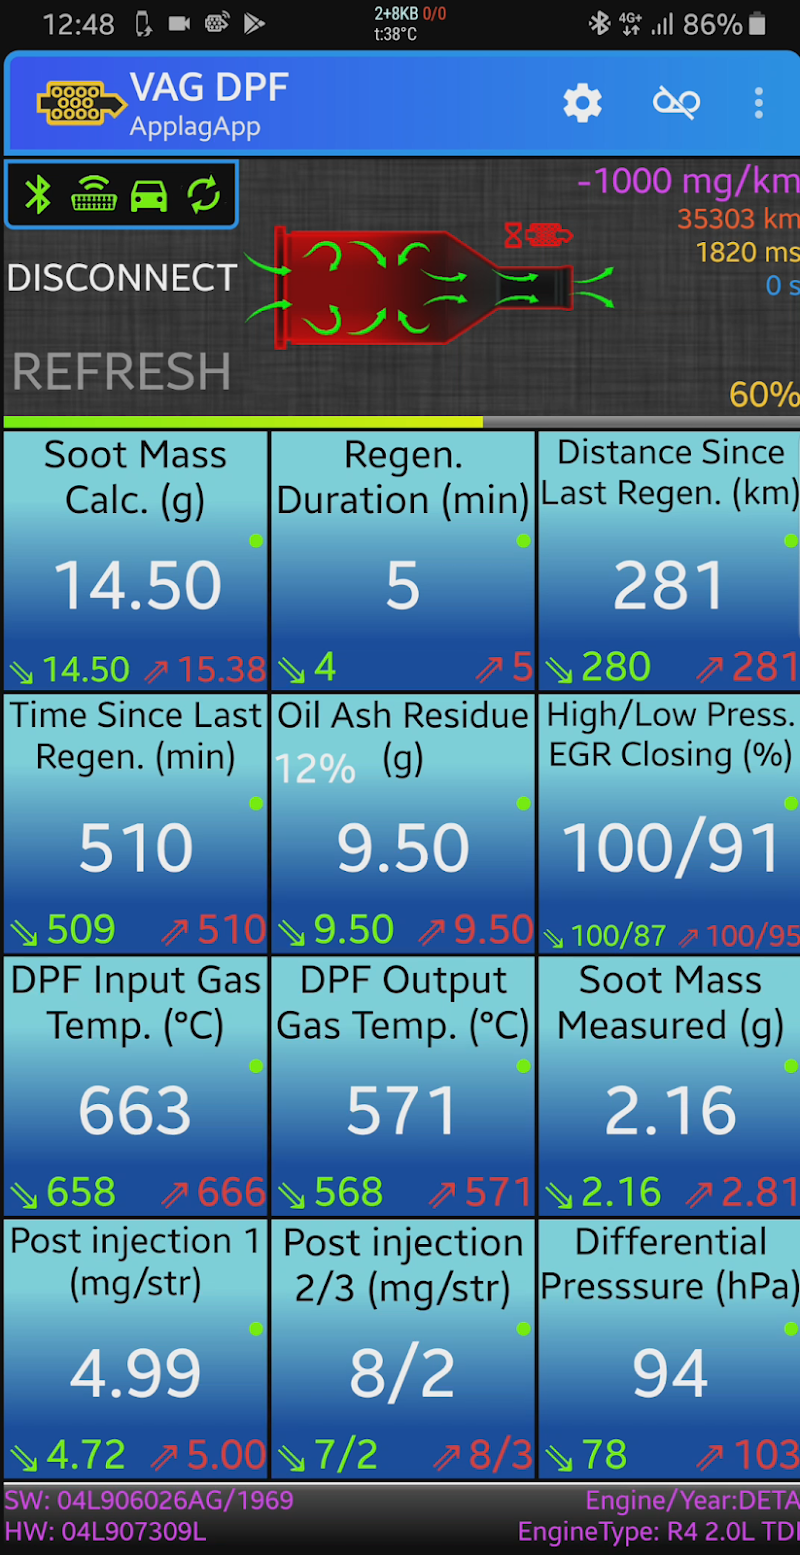 VAG DPF Screenshot 0